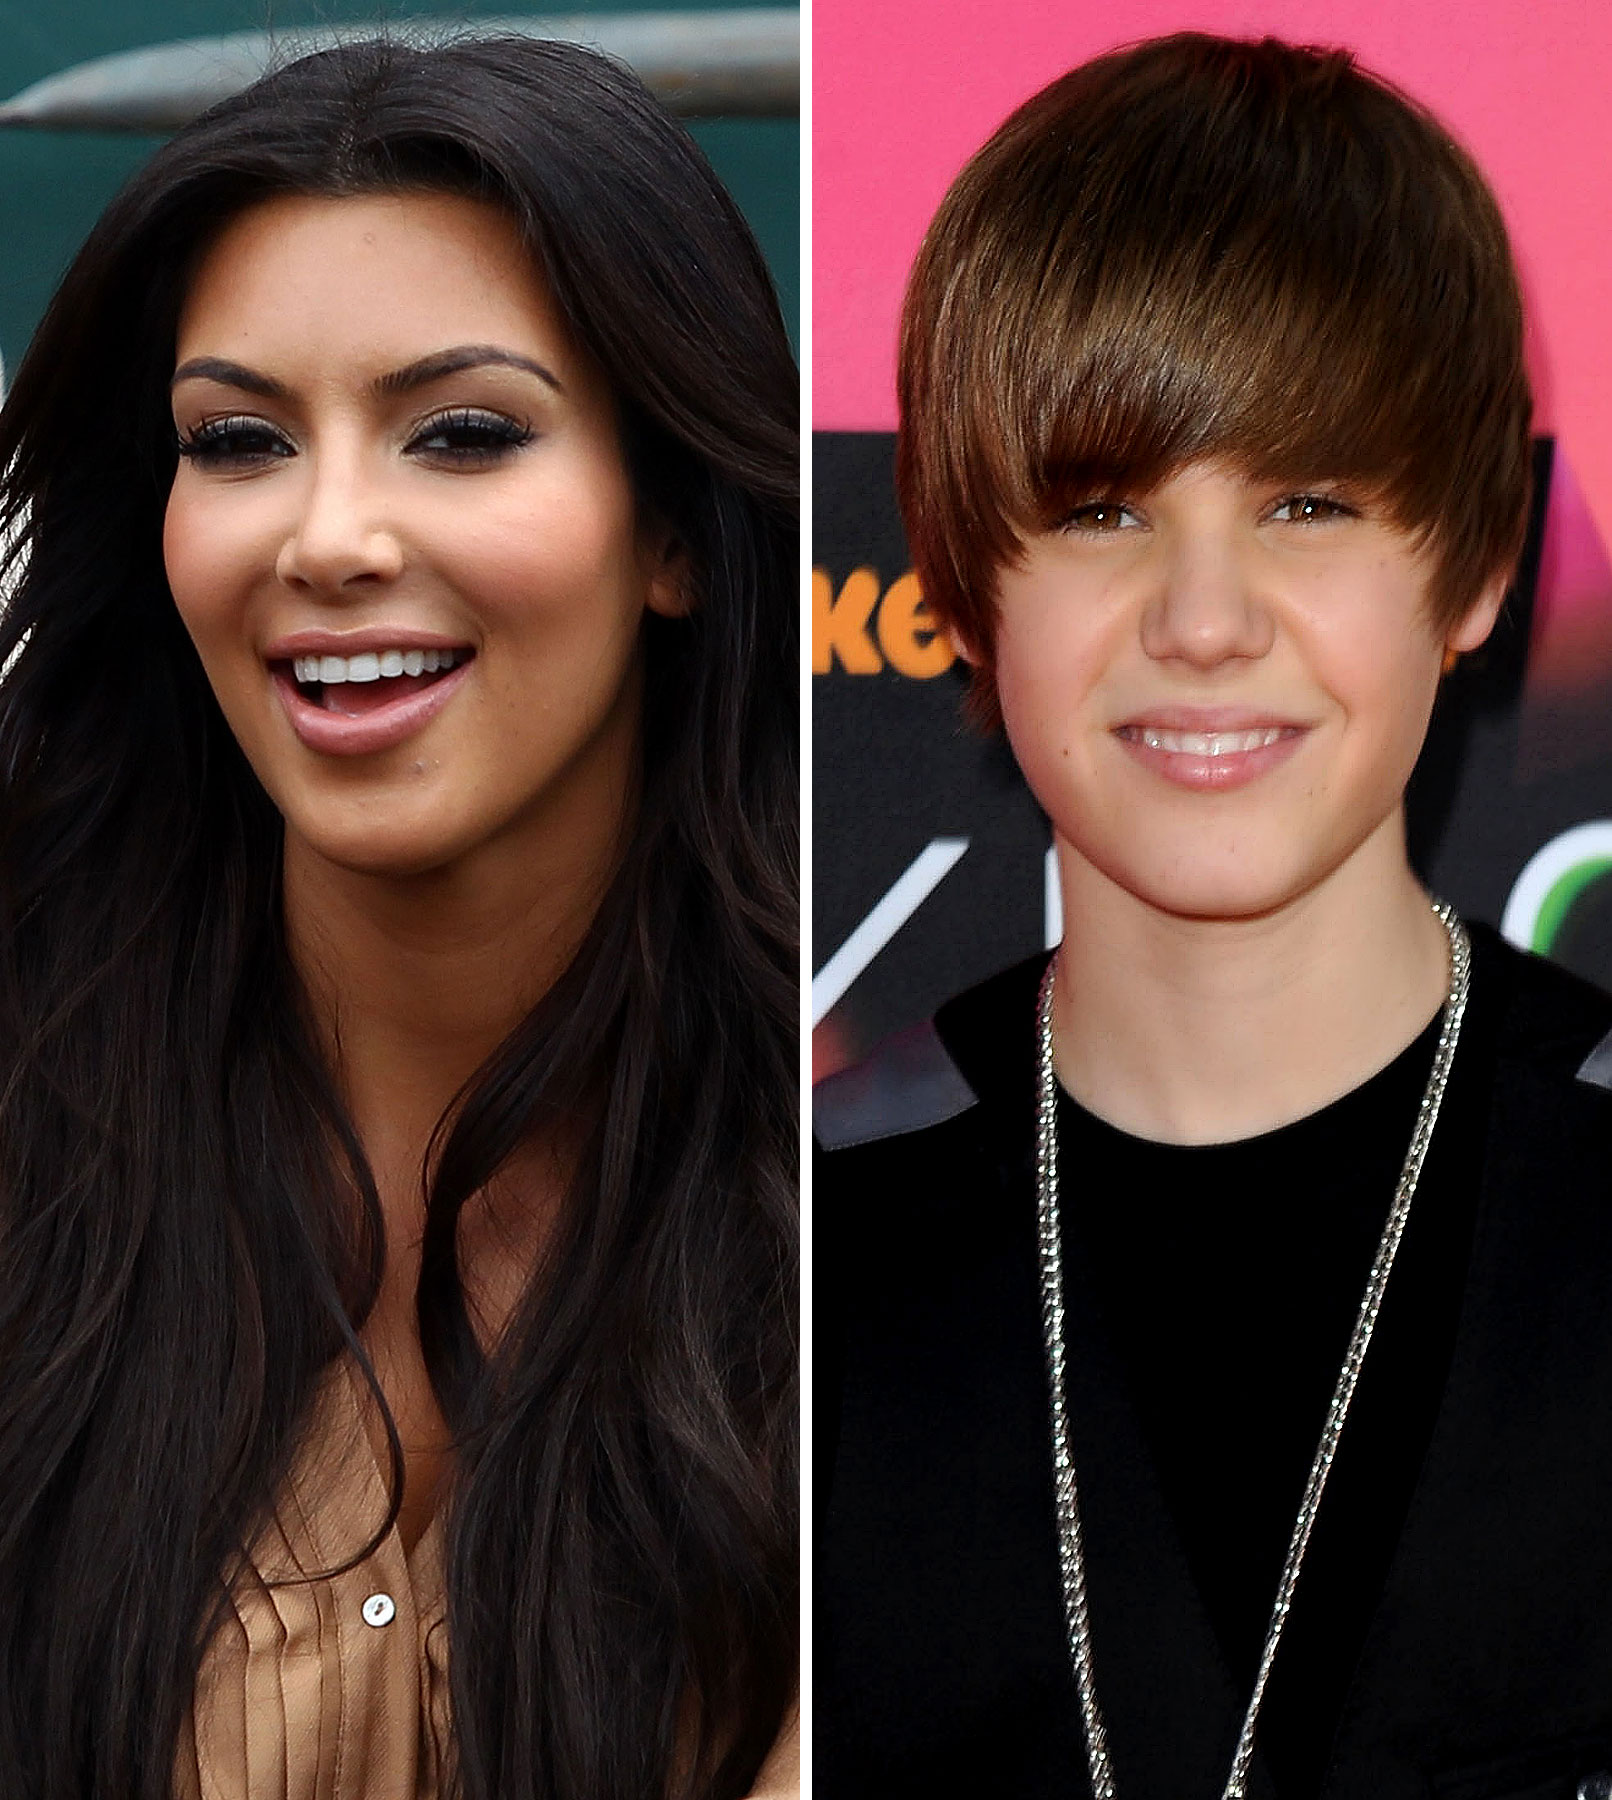 Justin Bieber Needs To Beef Up For Kim Kardashian